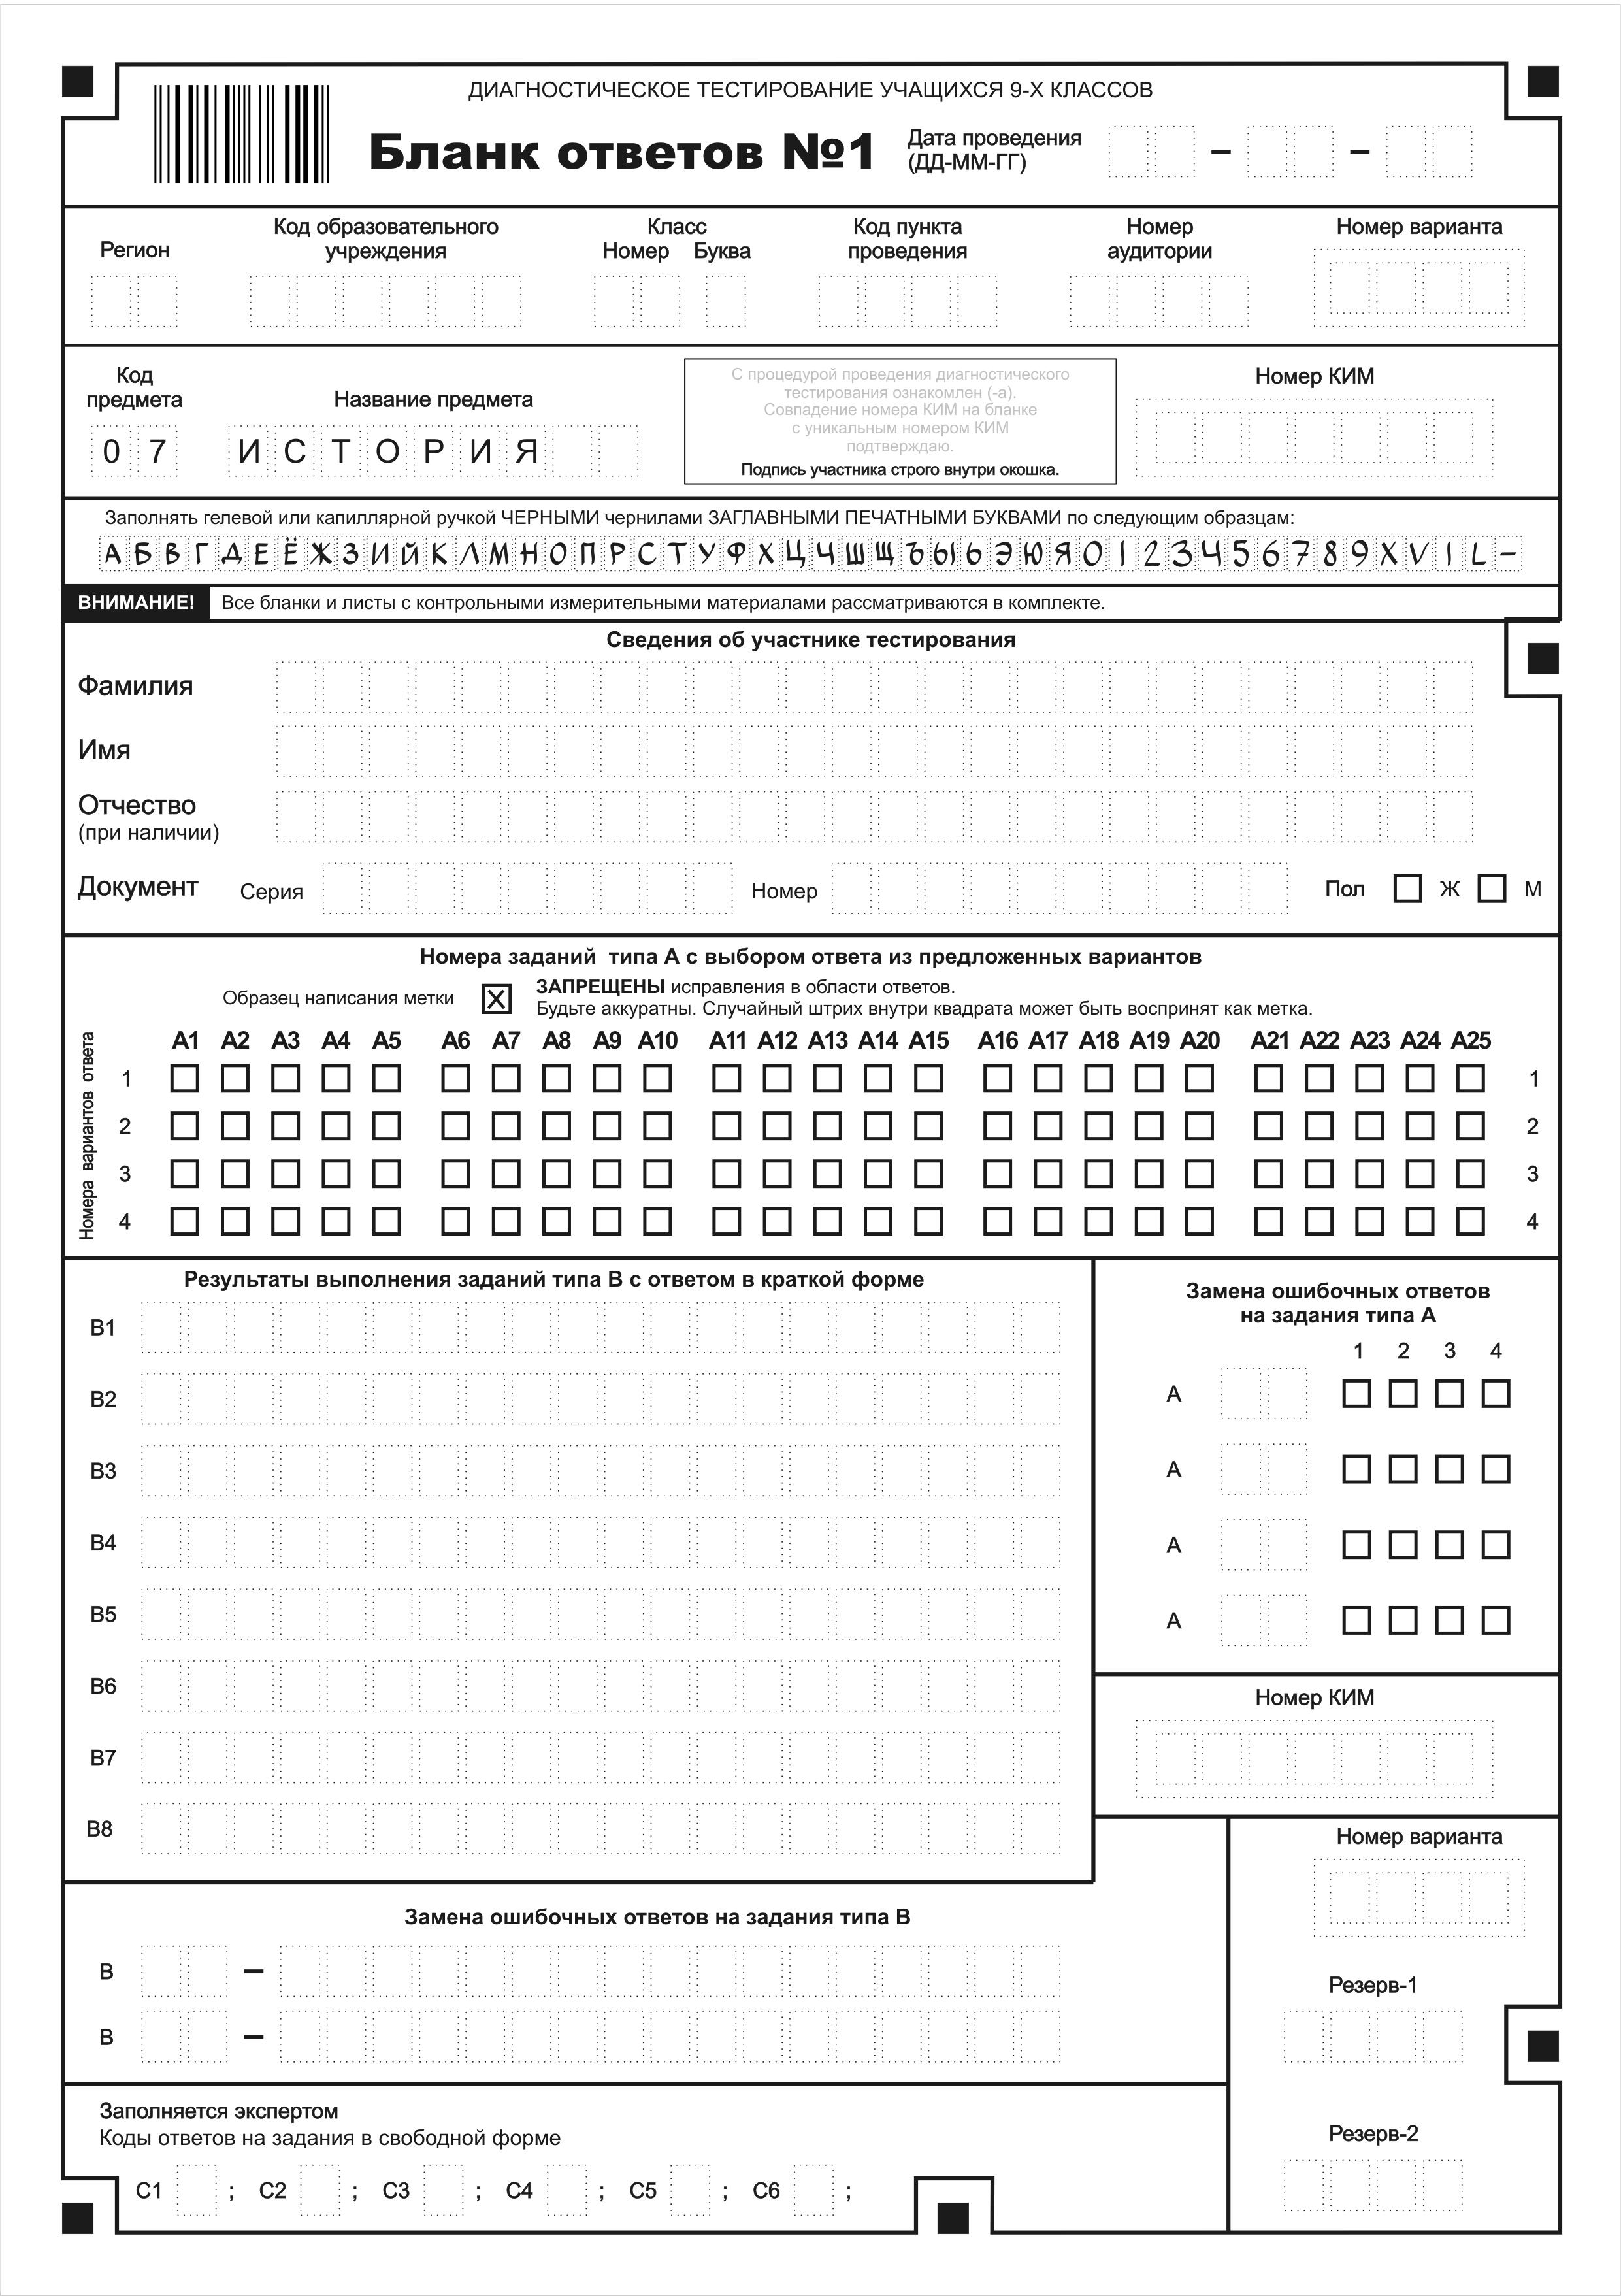 Рабочая программа по русскому языку 11